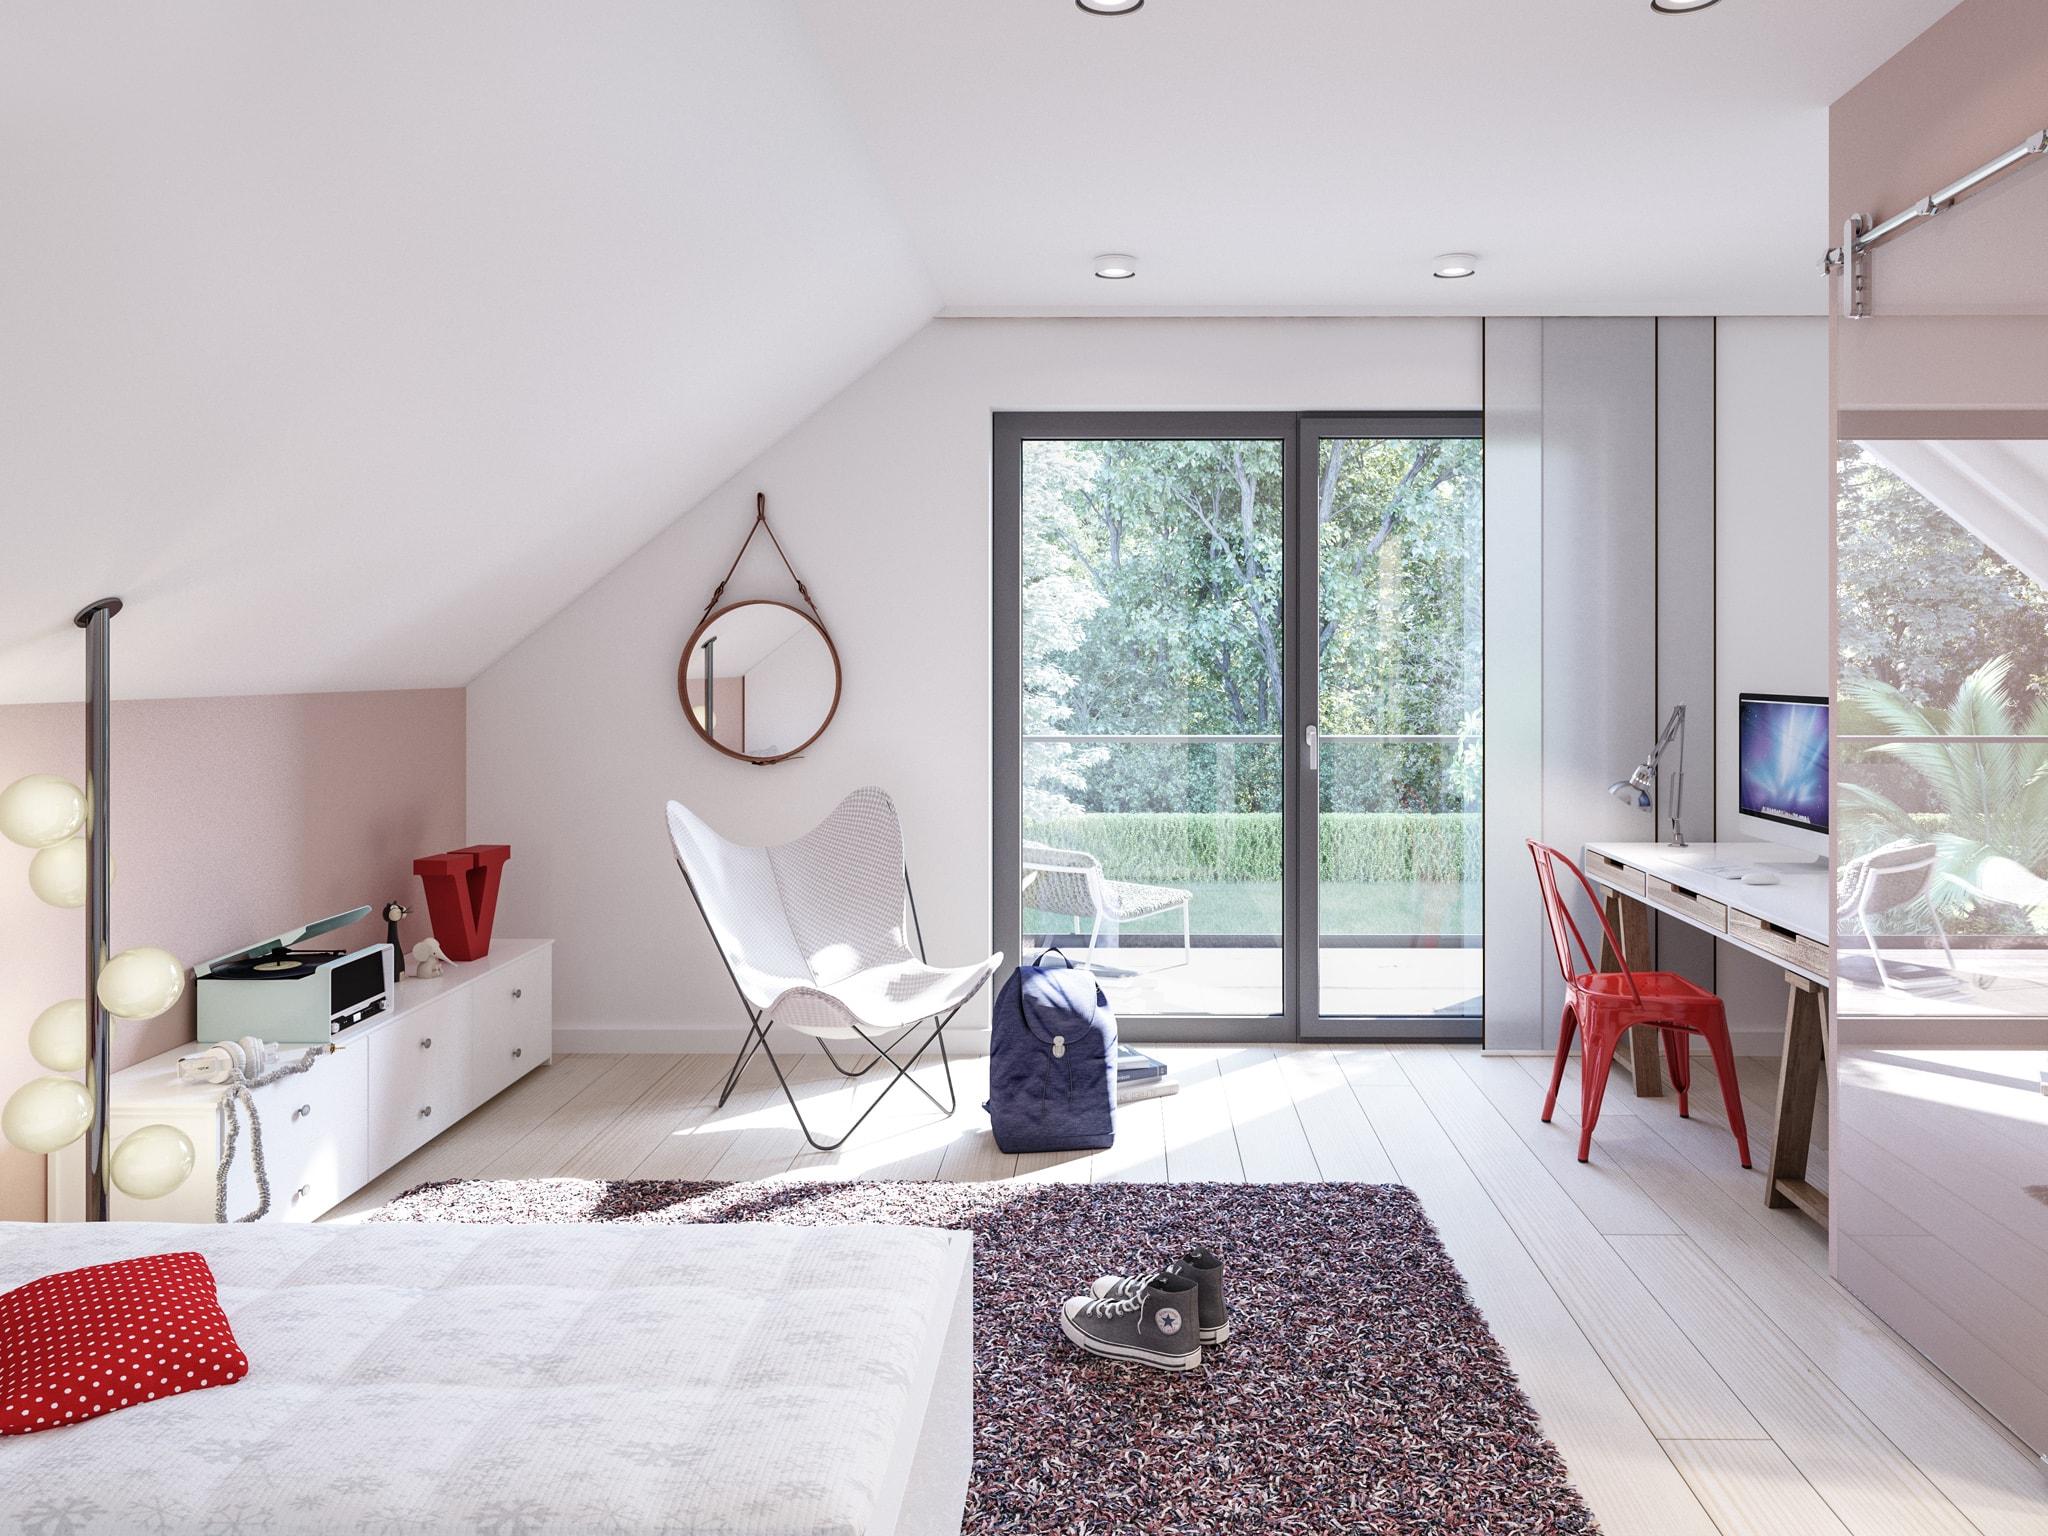 Kinderzimmer mit Dachschräge - Ideen Inneneinrichtung Bien Zenker Fertighaus FANTASTIC 165 V5 - HausbauDirekt.de